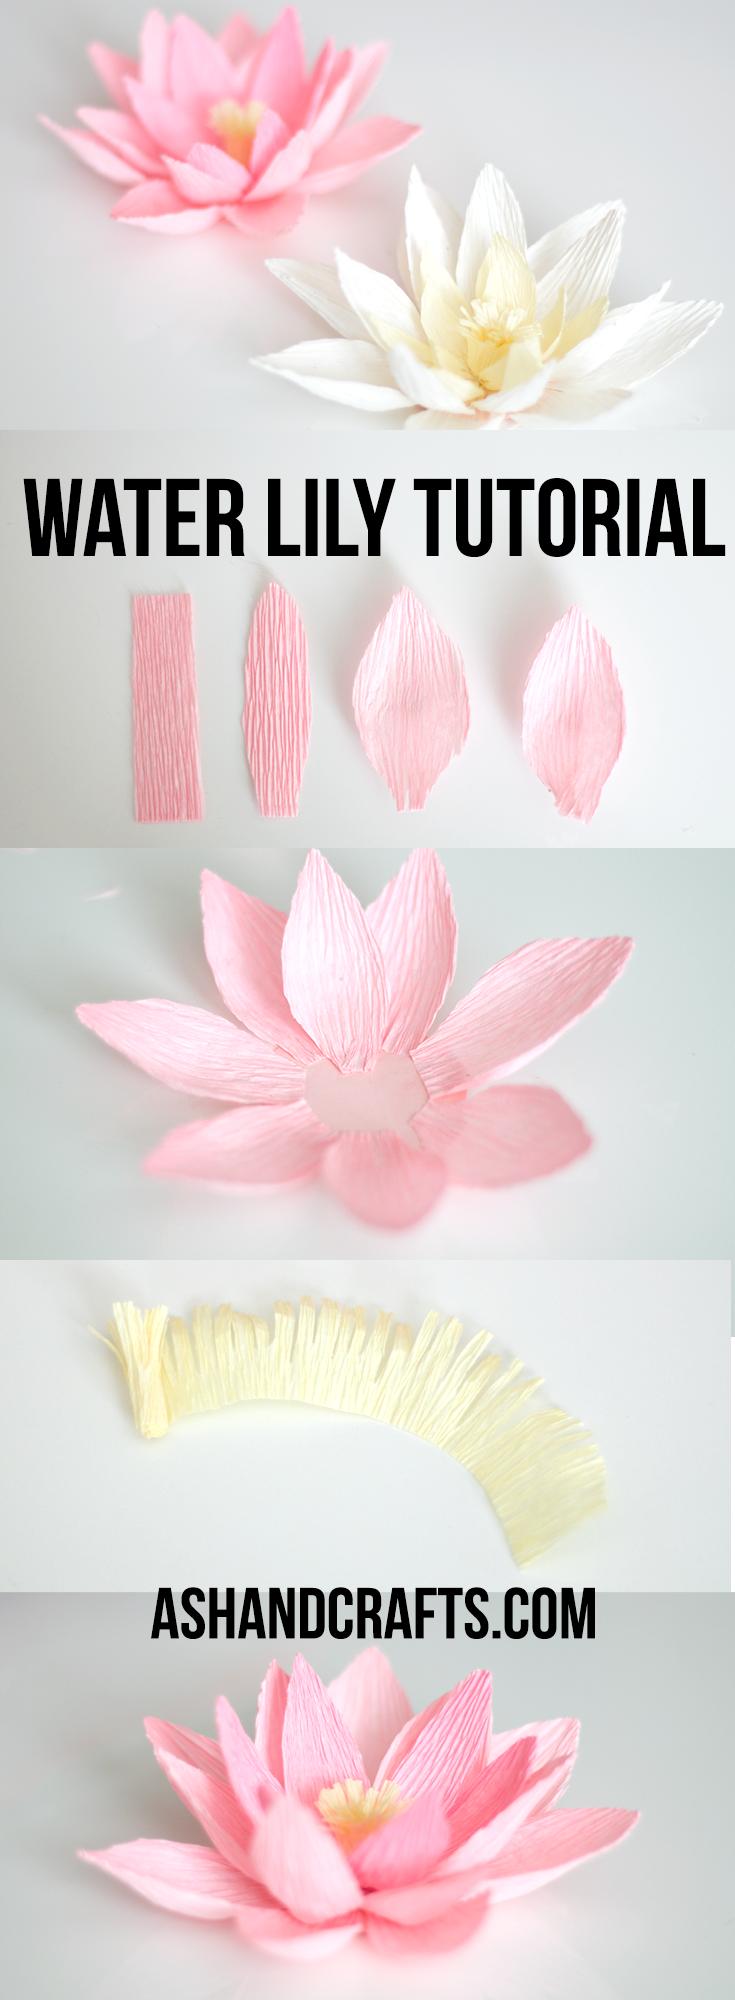 Crepe paper water lily crepe paper water lilies and crepes crepe paper water lily tutorial ashandcrafts izmirmasajfo